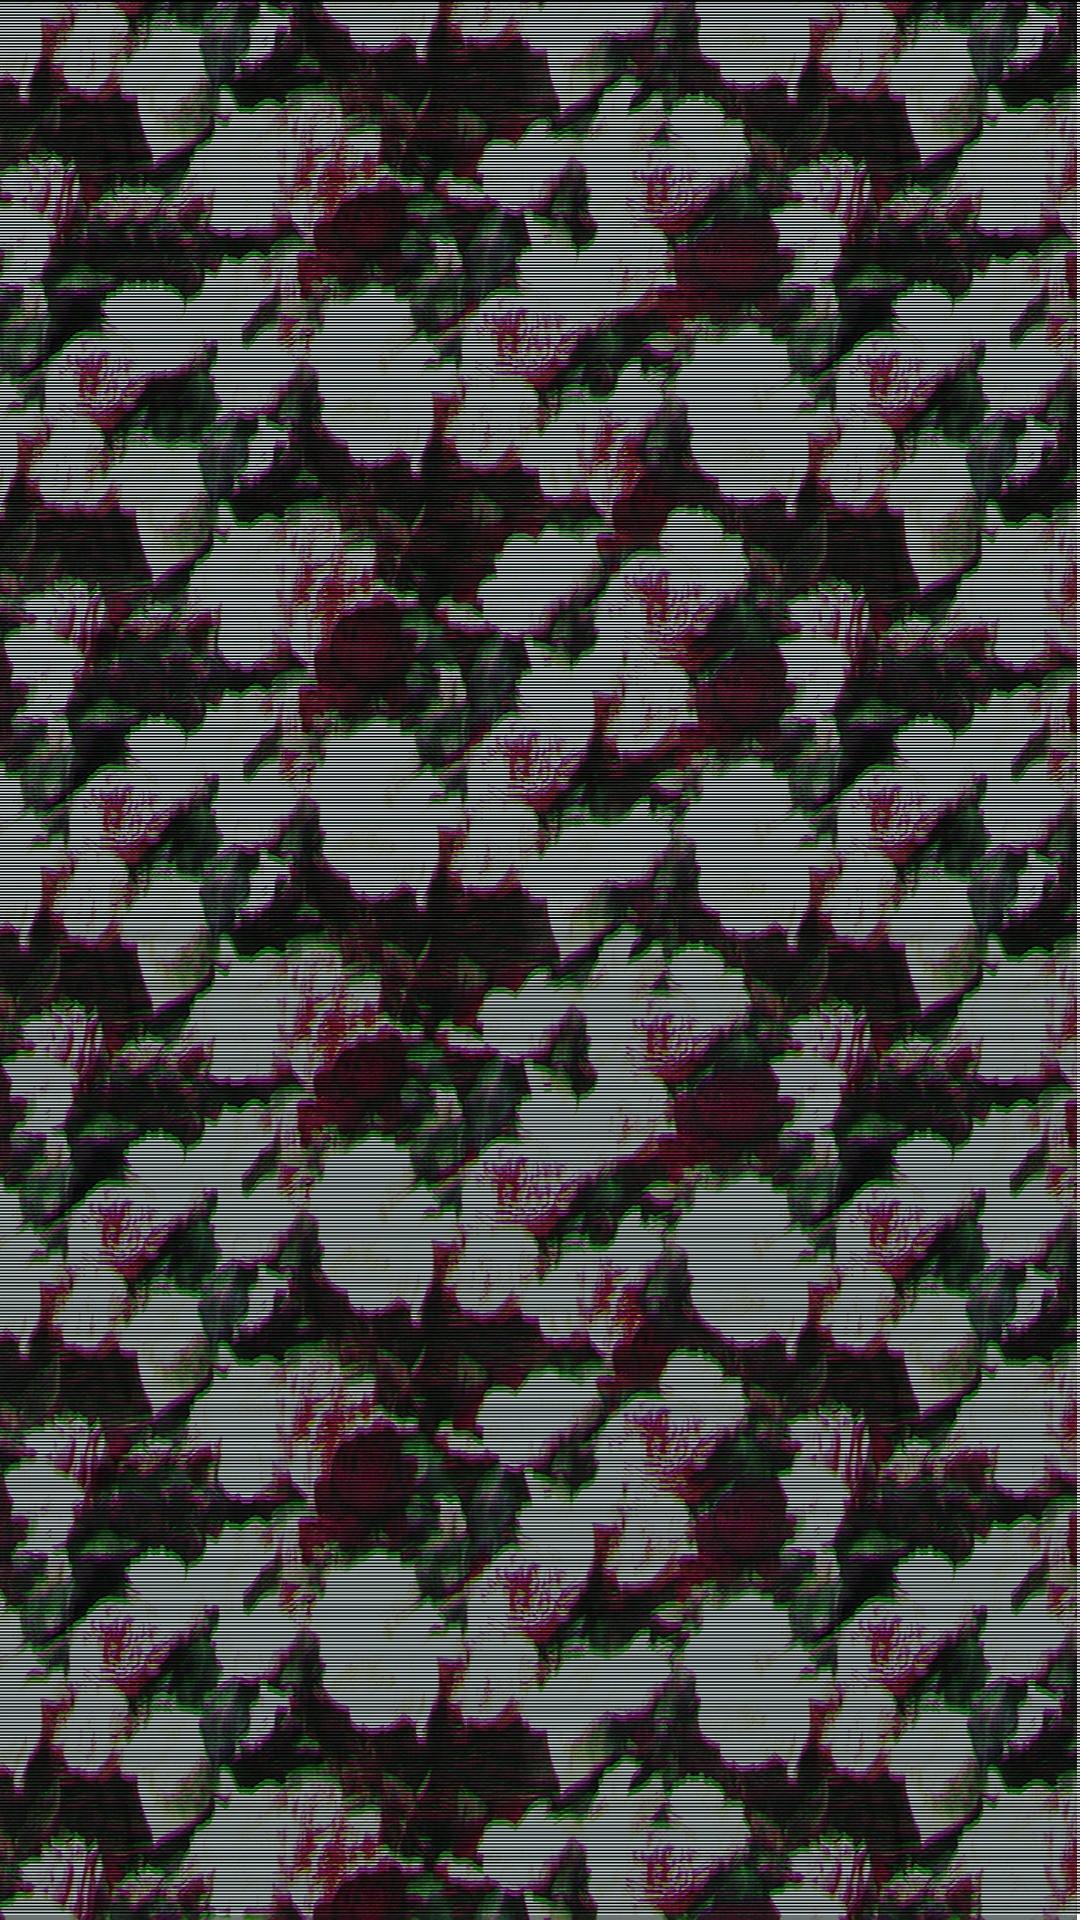 Goyard Wallpaper Iphone 6 Iphone Wallpaper Tumblr 183 ① Download Free Cool High